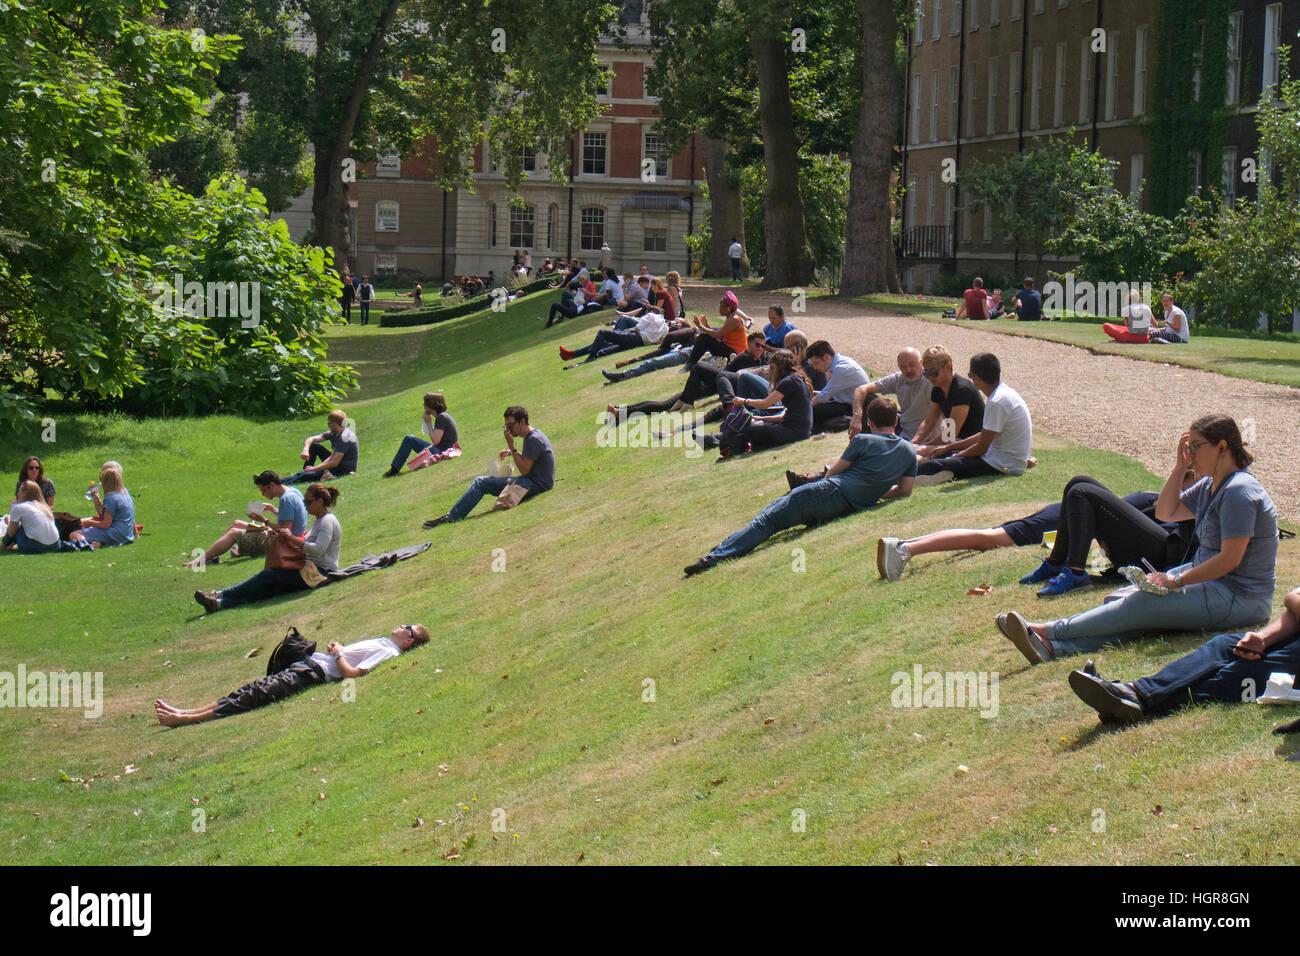 People enjoying the sunshine in Gray's Inn Gardens, London - Stock Image